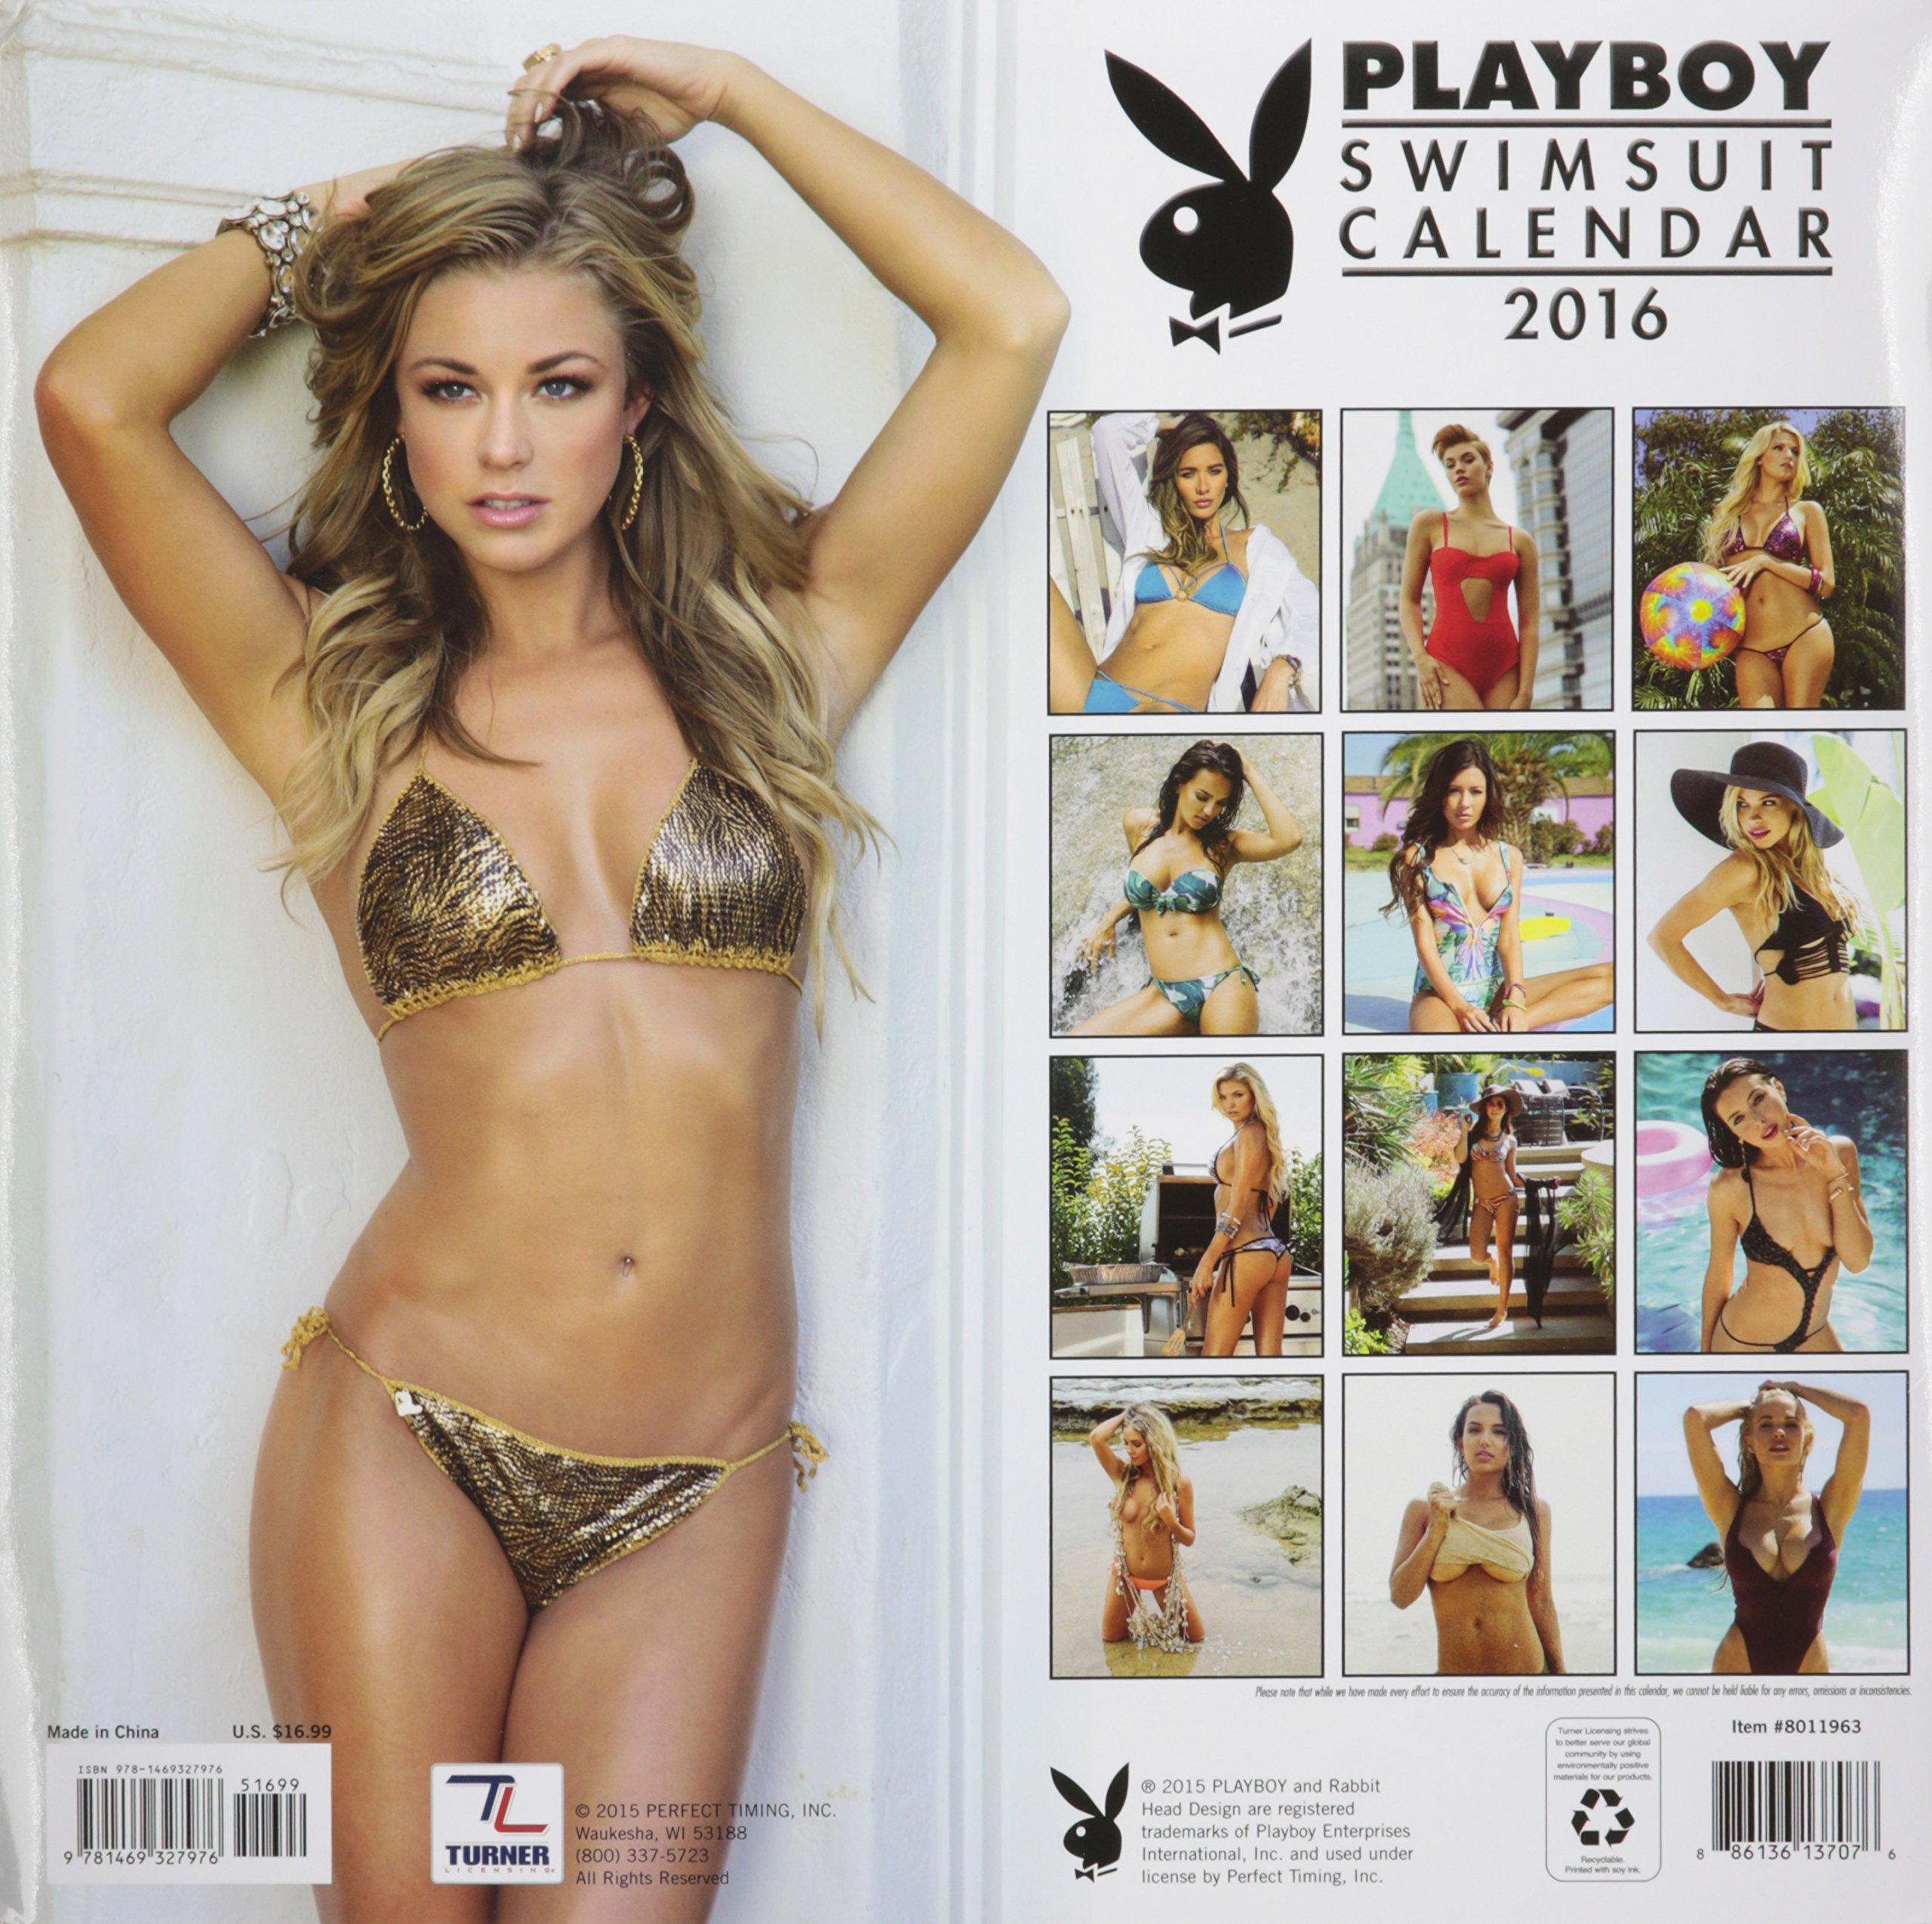 playboy kalender 2016 bilder